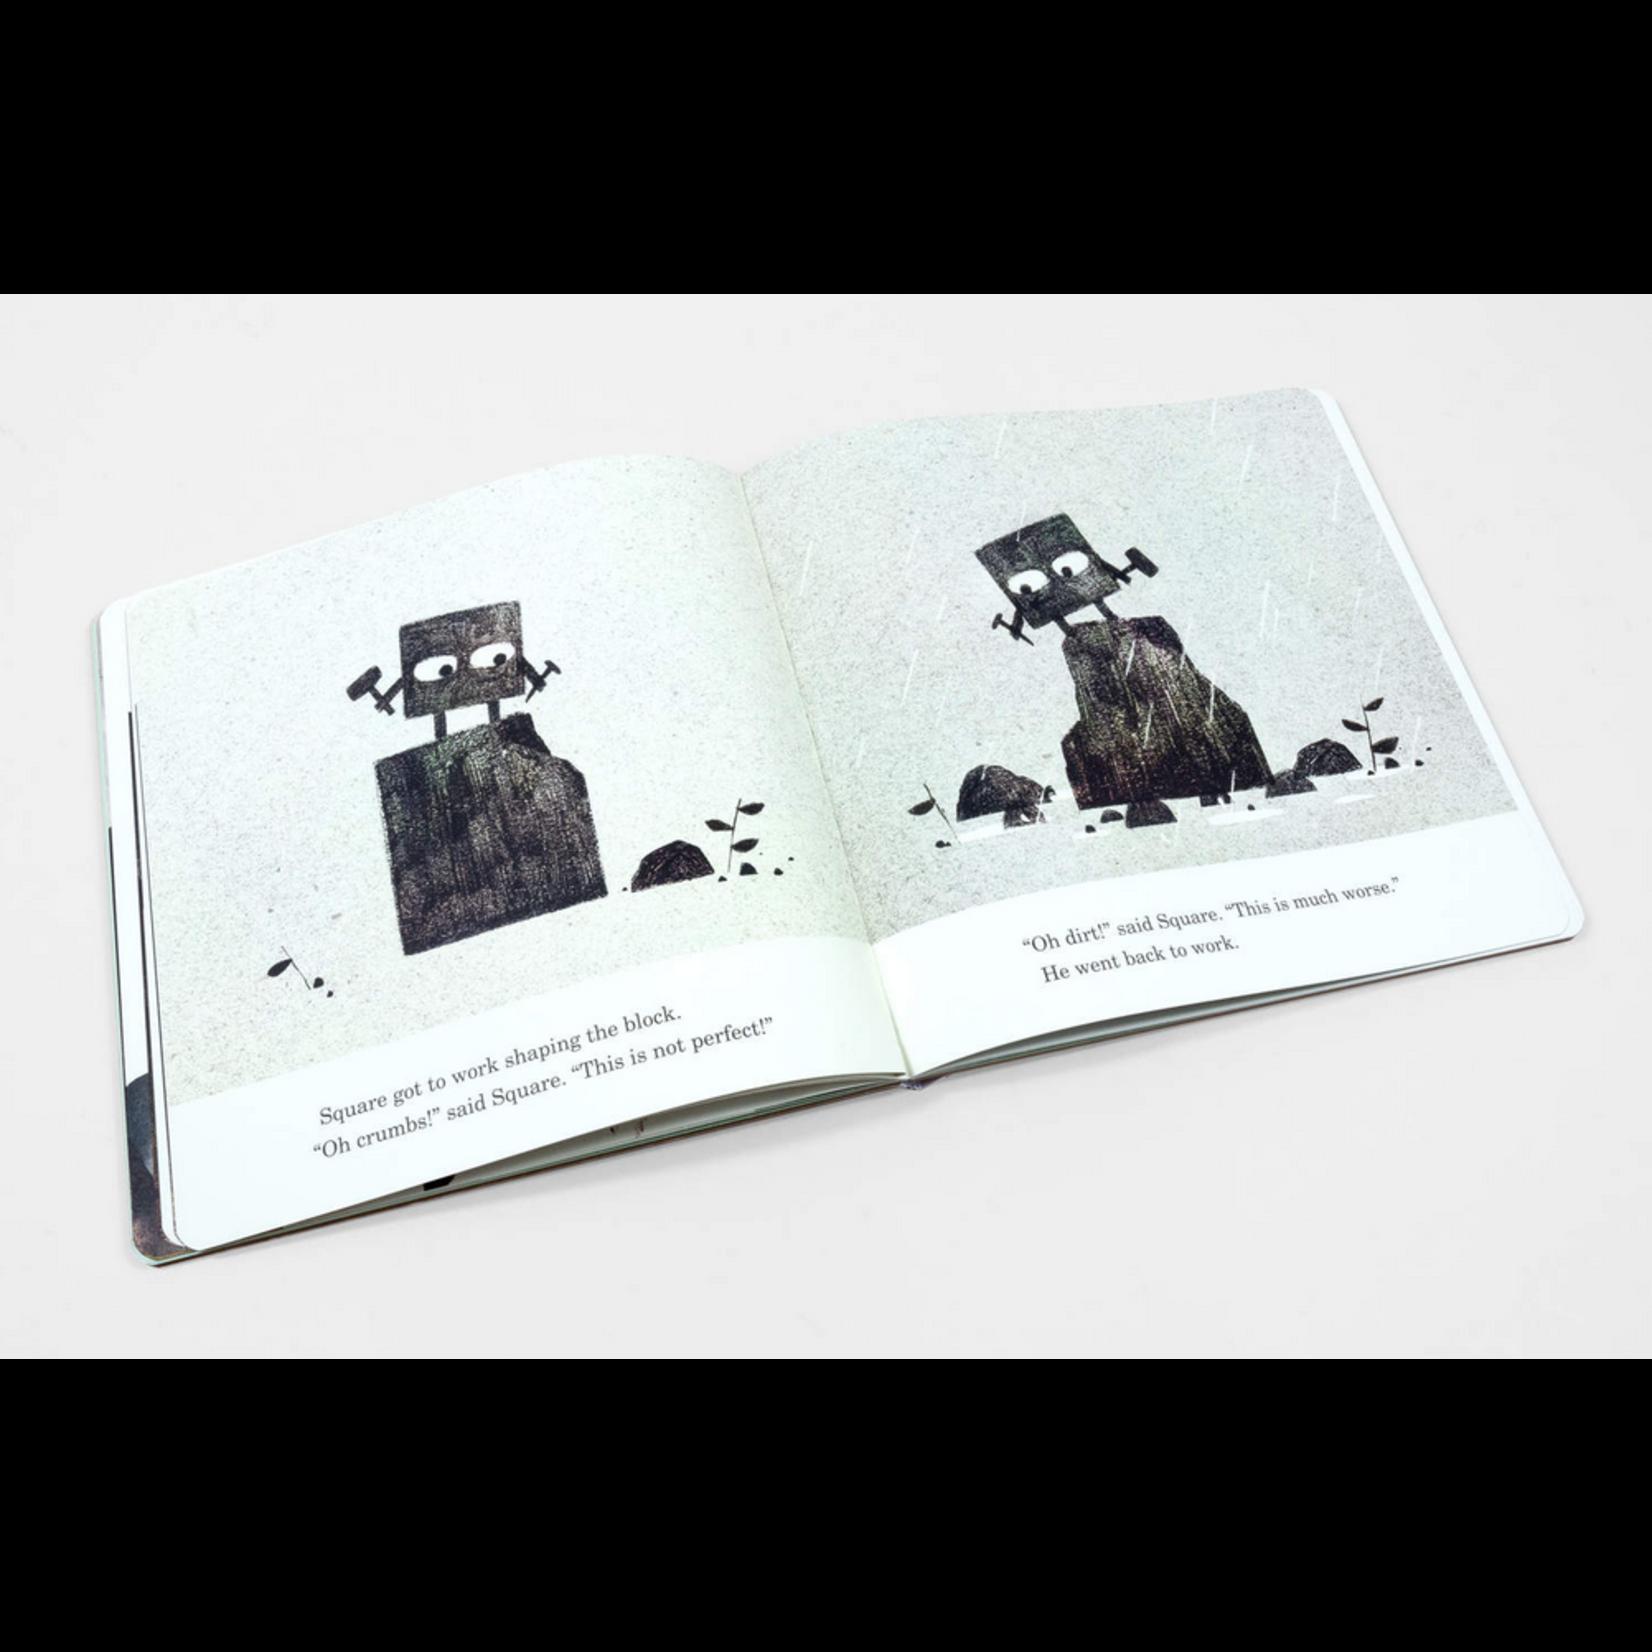 Mac Barnett Square Book - Mac Barnett & Jon Klassen